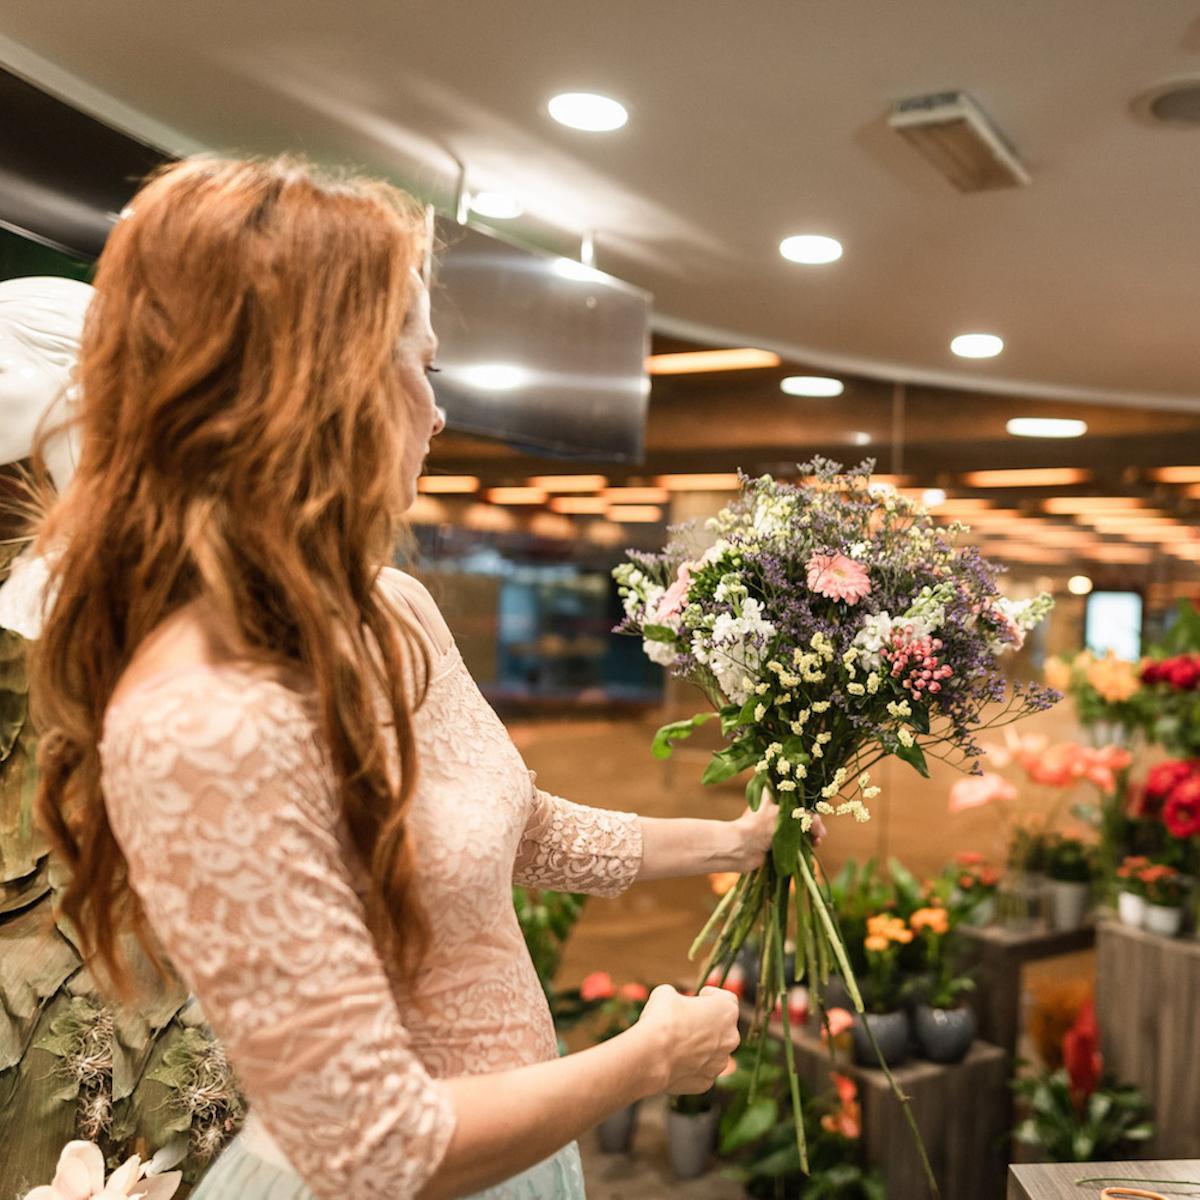 nika veger cvetlicarna gardenia tecaj izdelave sopka beautyfullblog